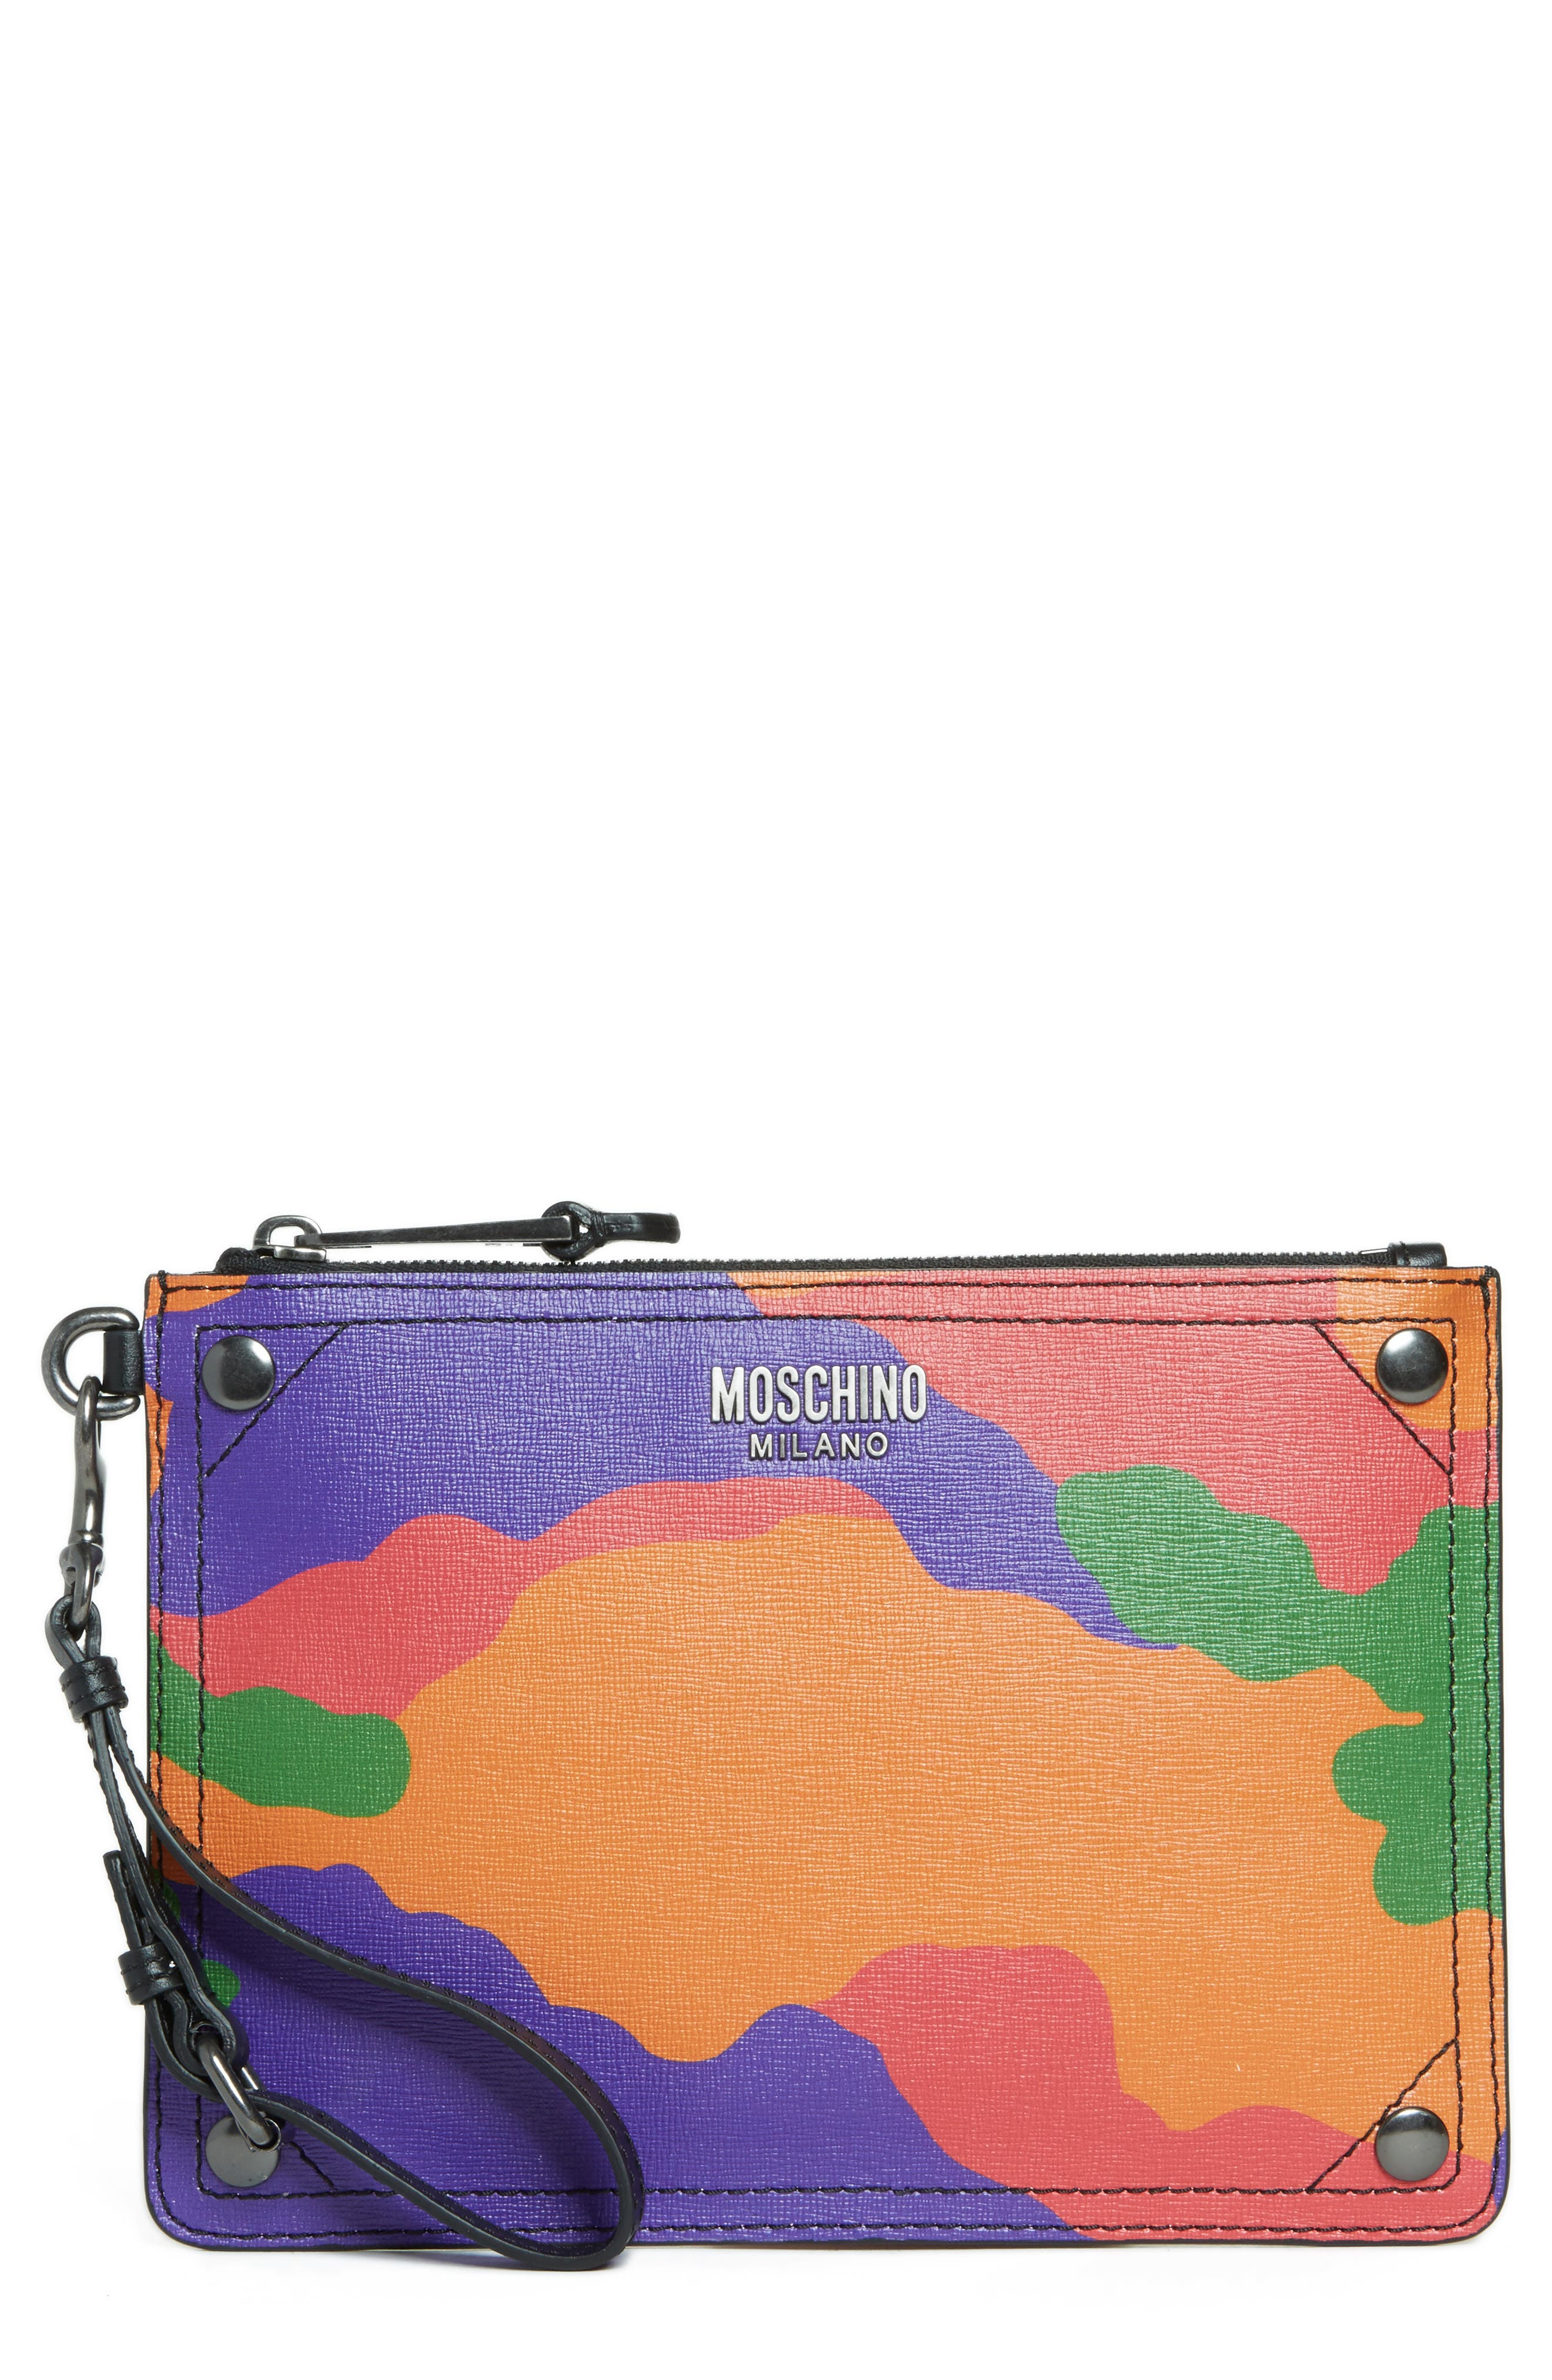 Multi Camo Print Leather Zip Pouch Wristlet,                             Main thumbnail 1, color,                             Camo Multi